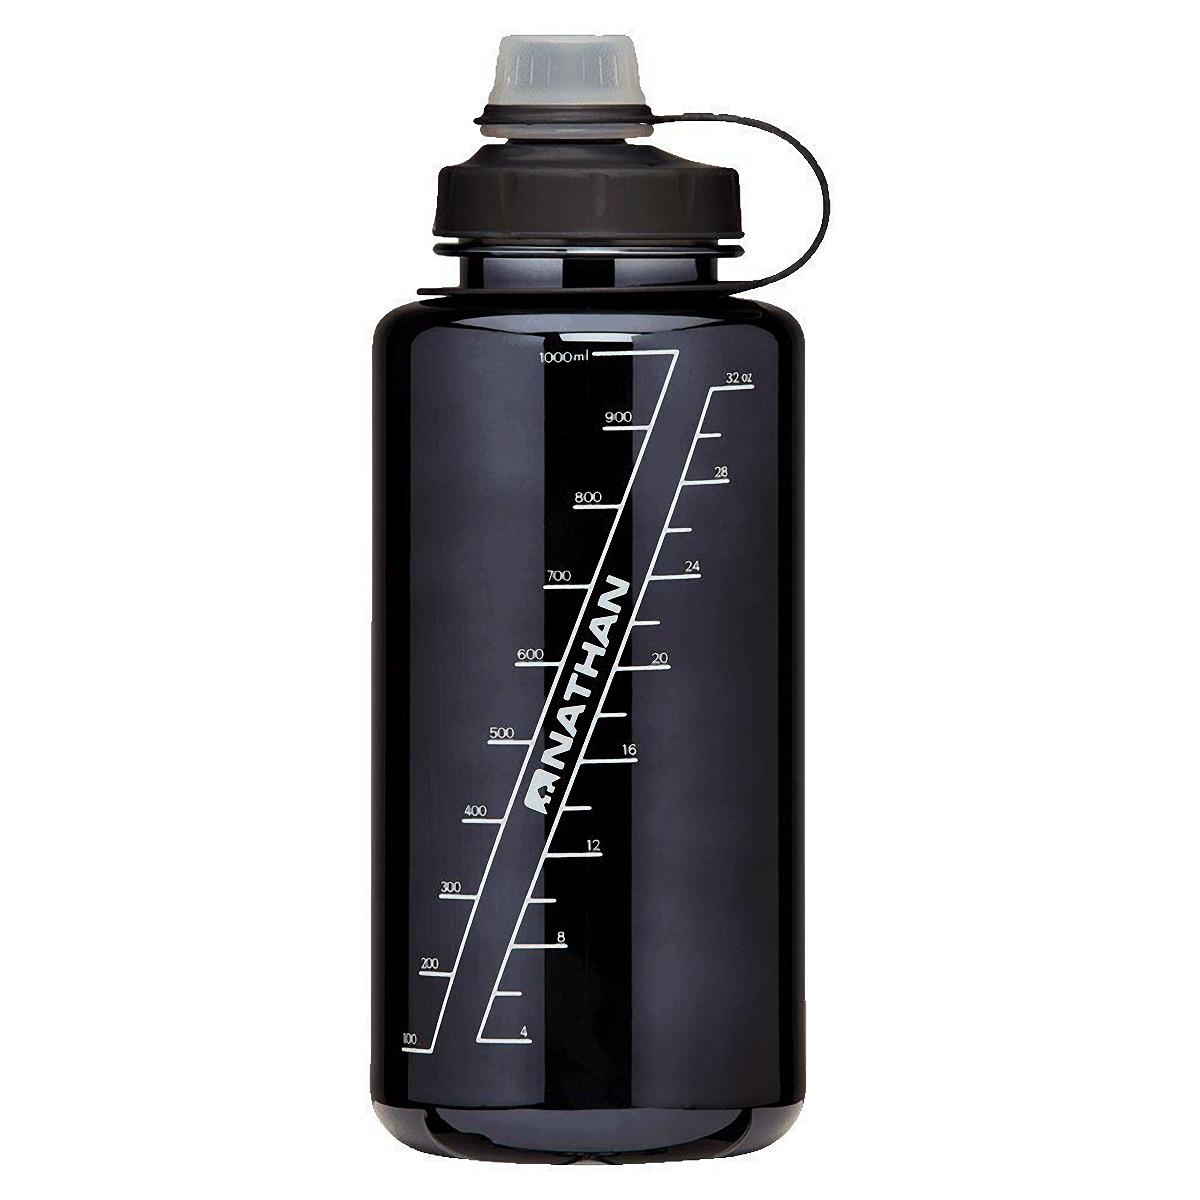 Nathan Bigshot 1 L Hydration Bottle - Color: Black/White - Size: One Size, Black/White, large, image 2